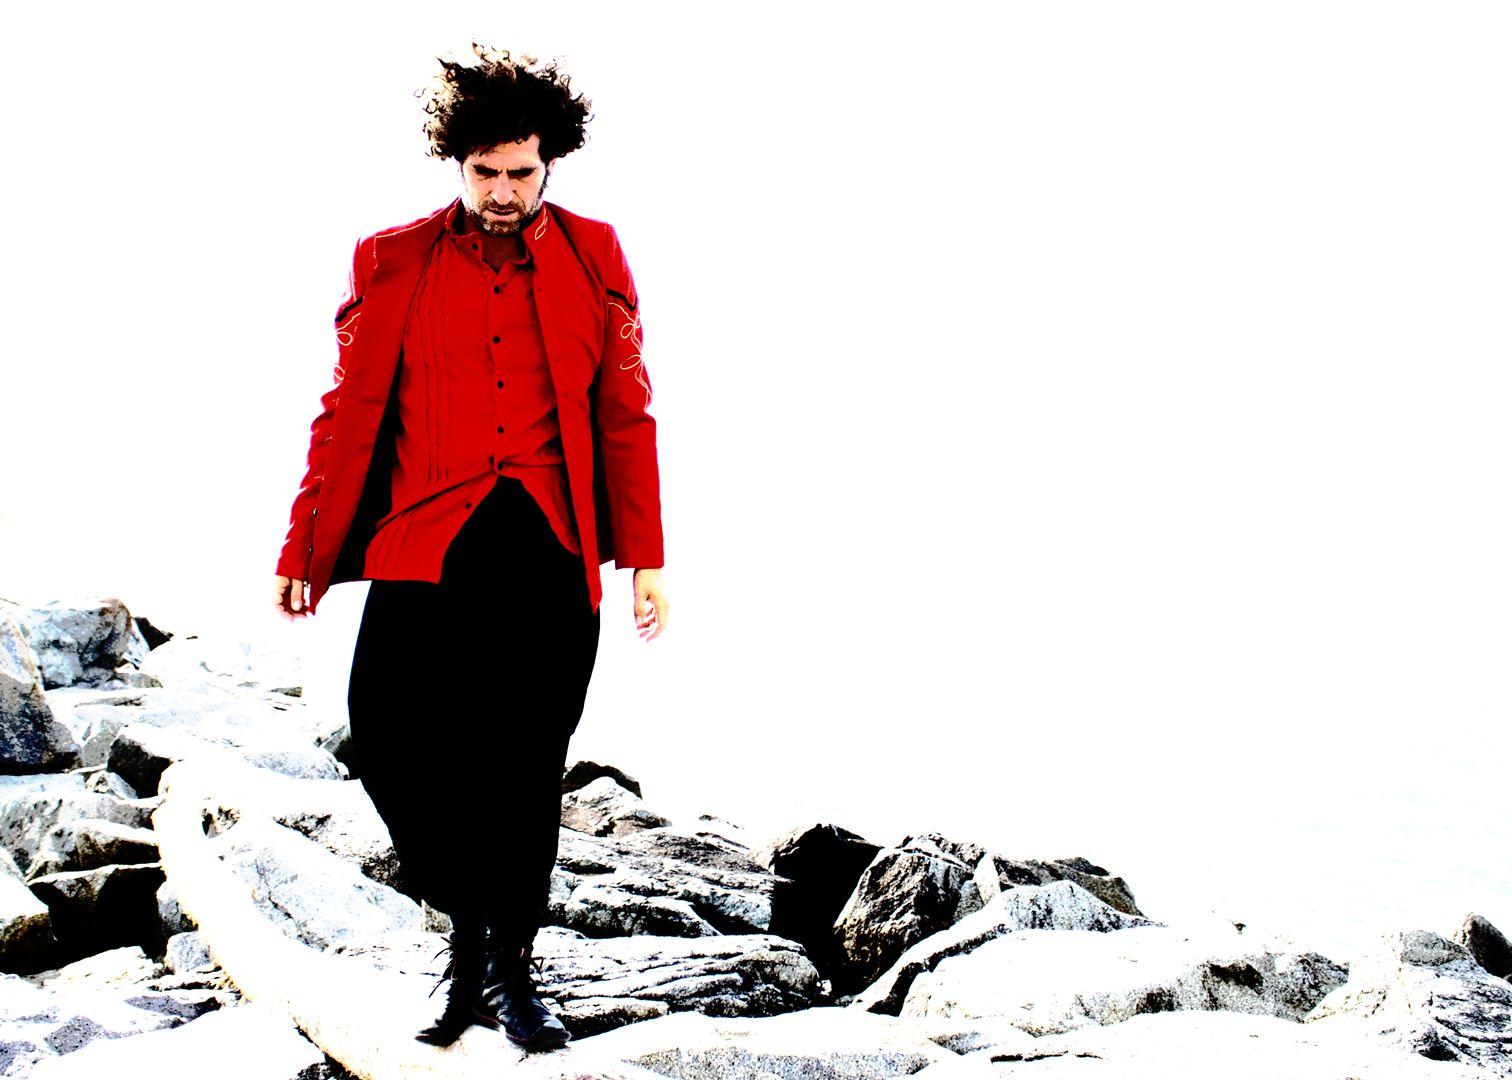 Tomeu Amer, Alba Sarraute, Festival Grec 2020, Desdemona, Shakespeare